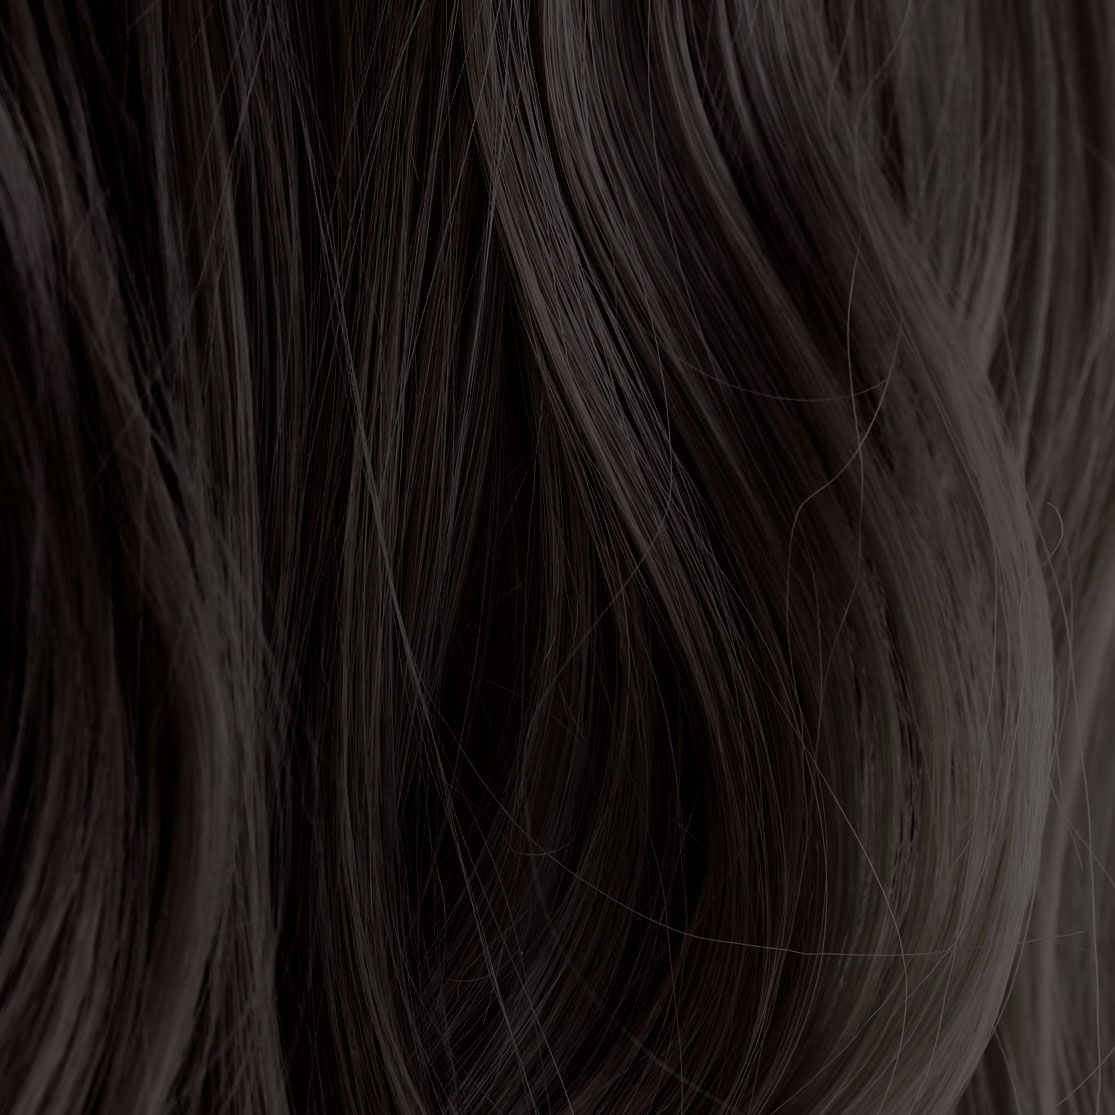 Dark Brown Henna Hair Dye Henna Color Lab Henna Hair Dye I